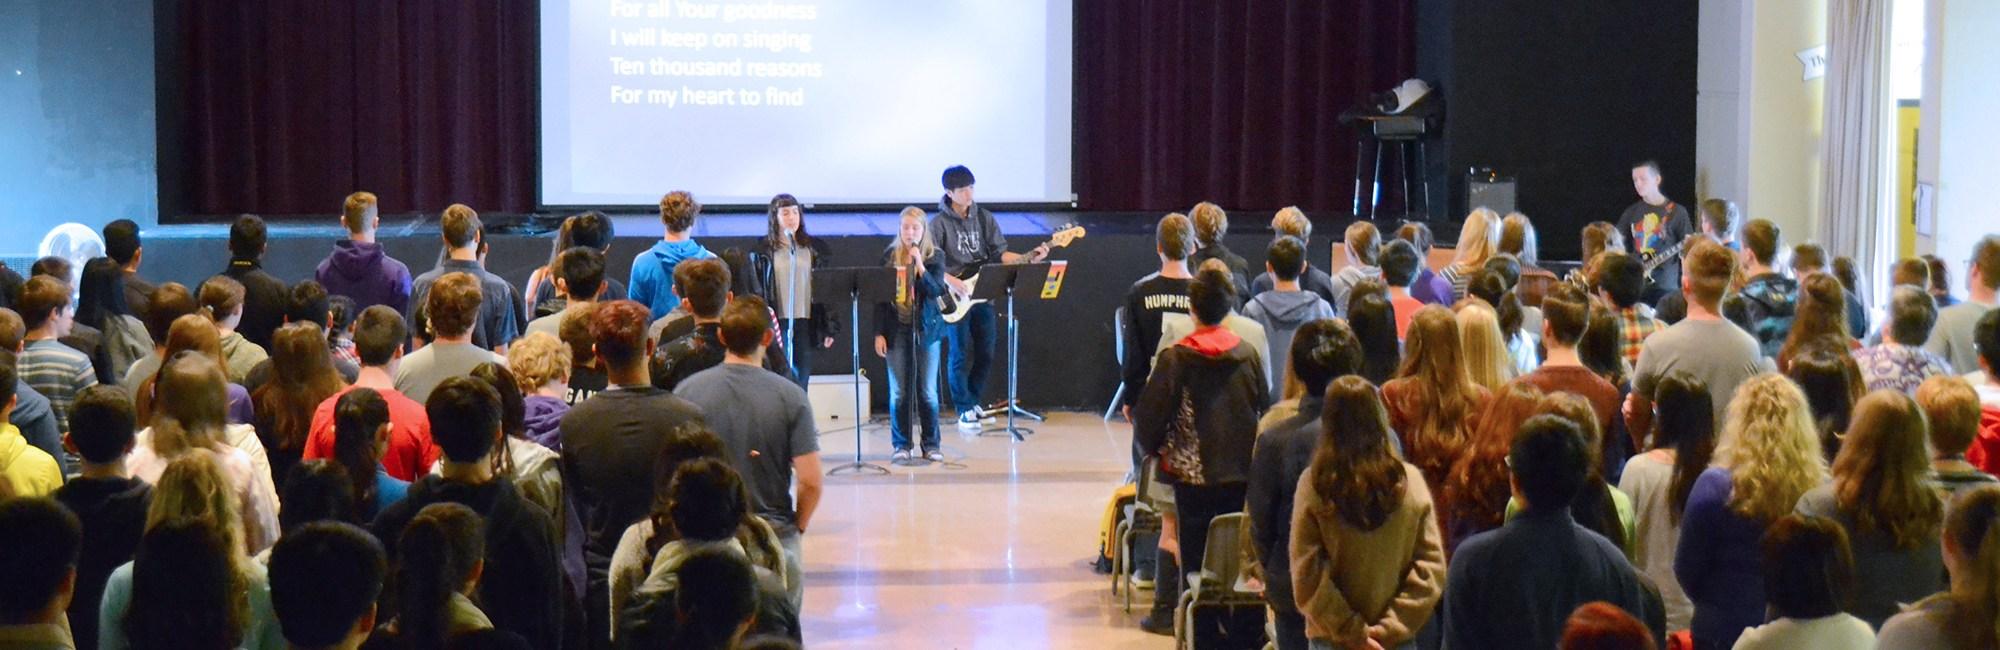 Sr High Chapel - student led worship